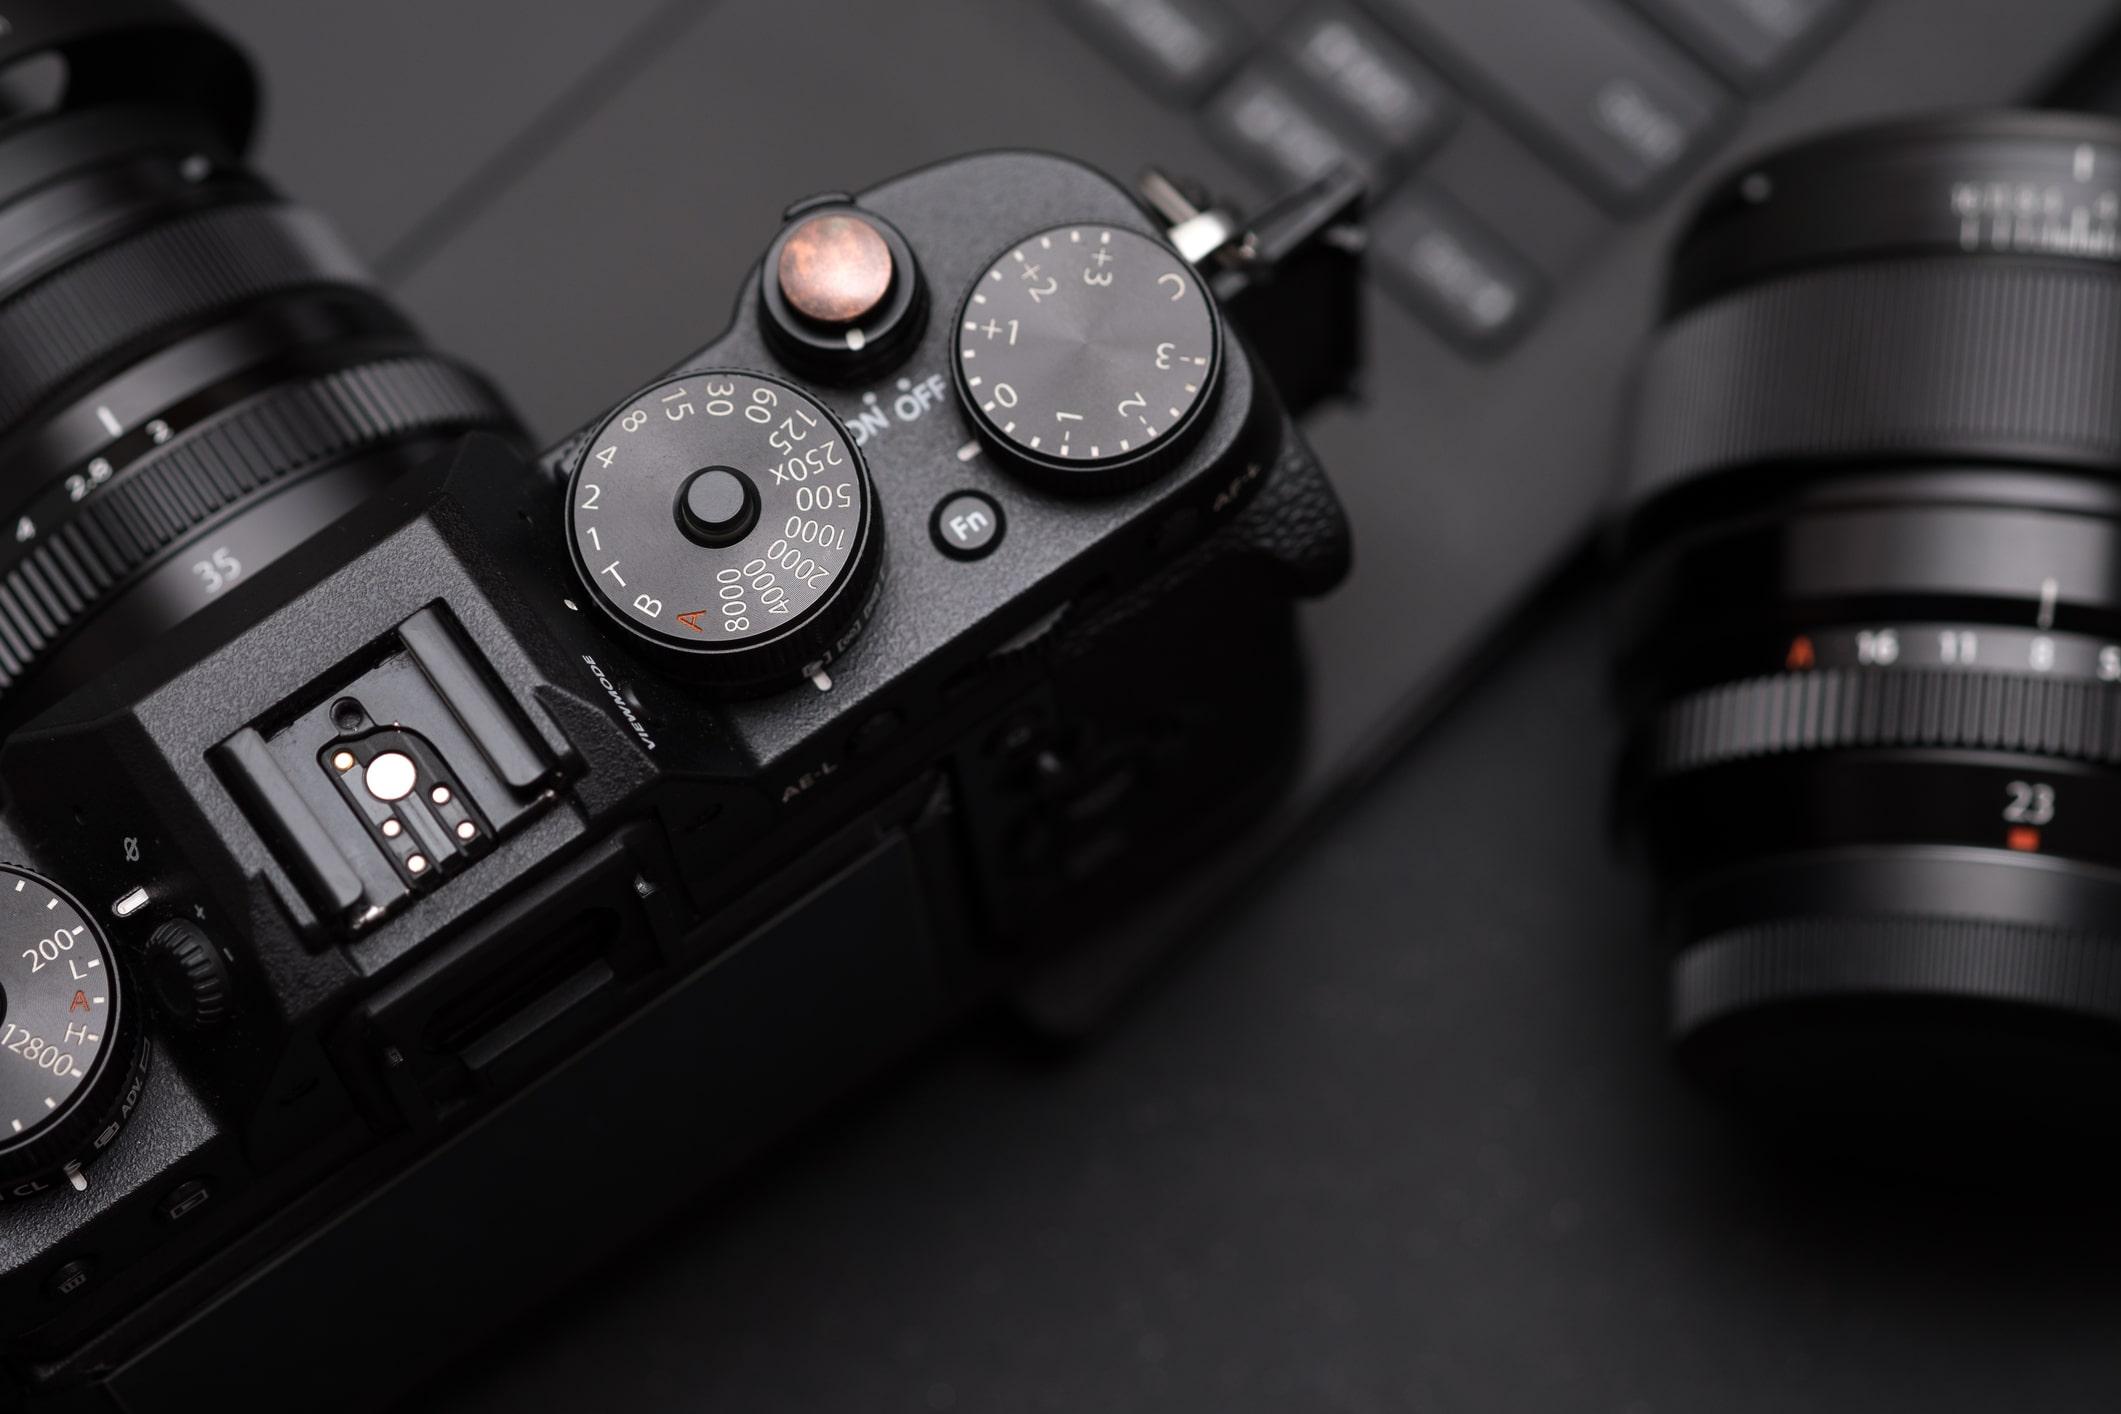 budget mirrorless cameras image